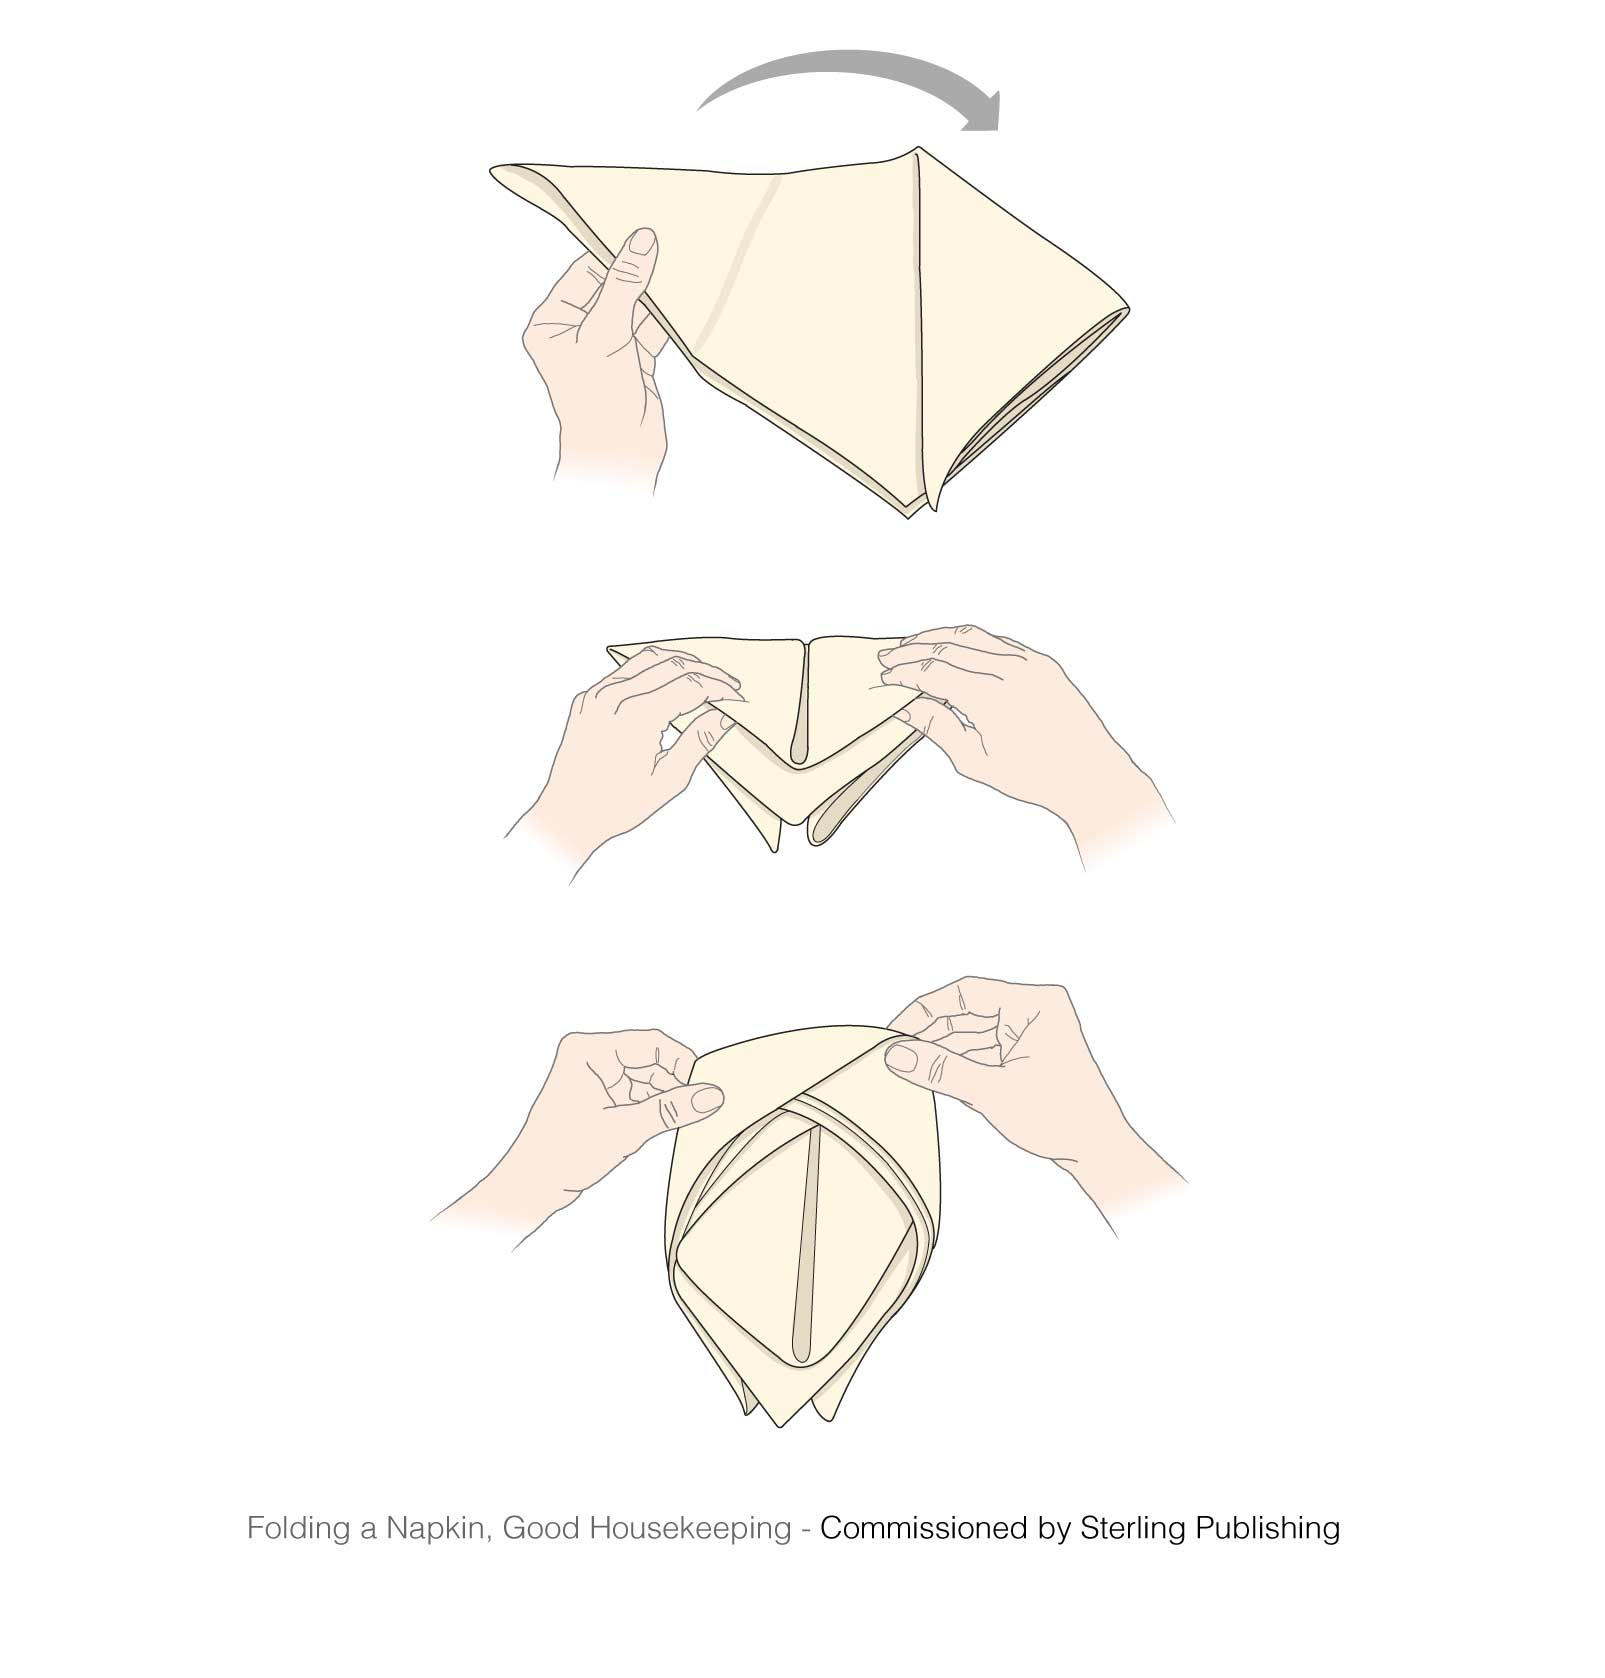 Folding-a-Napkin.jpg